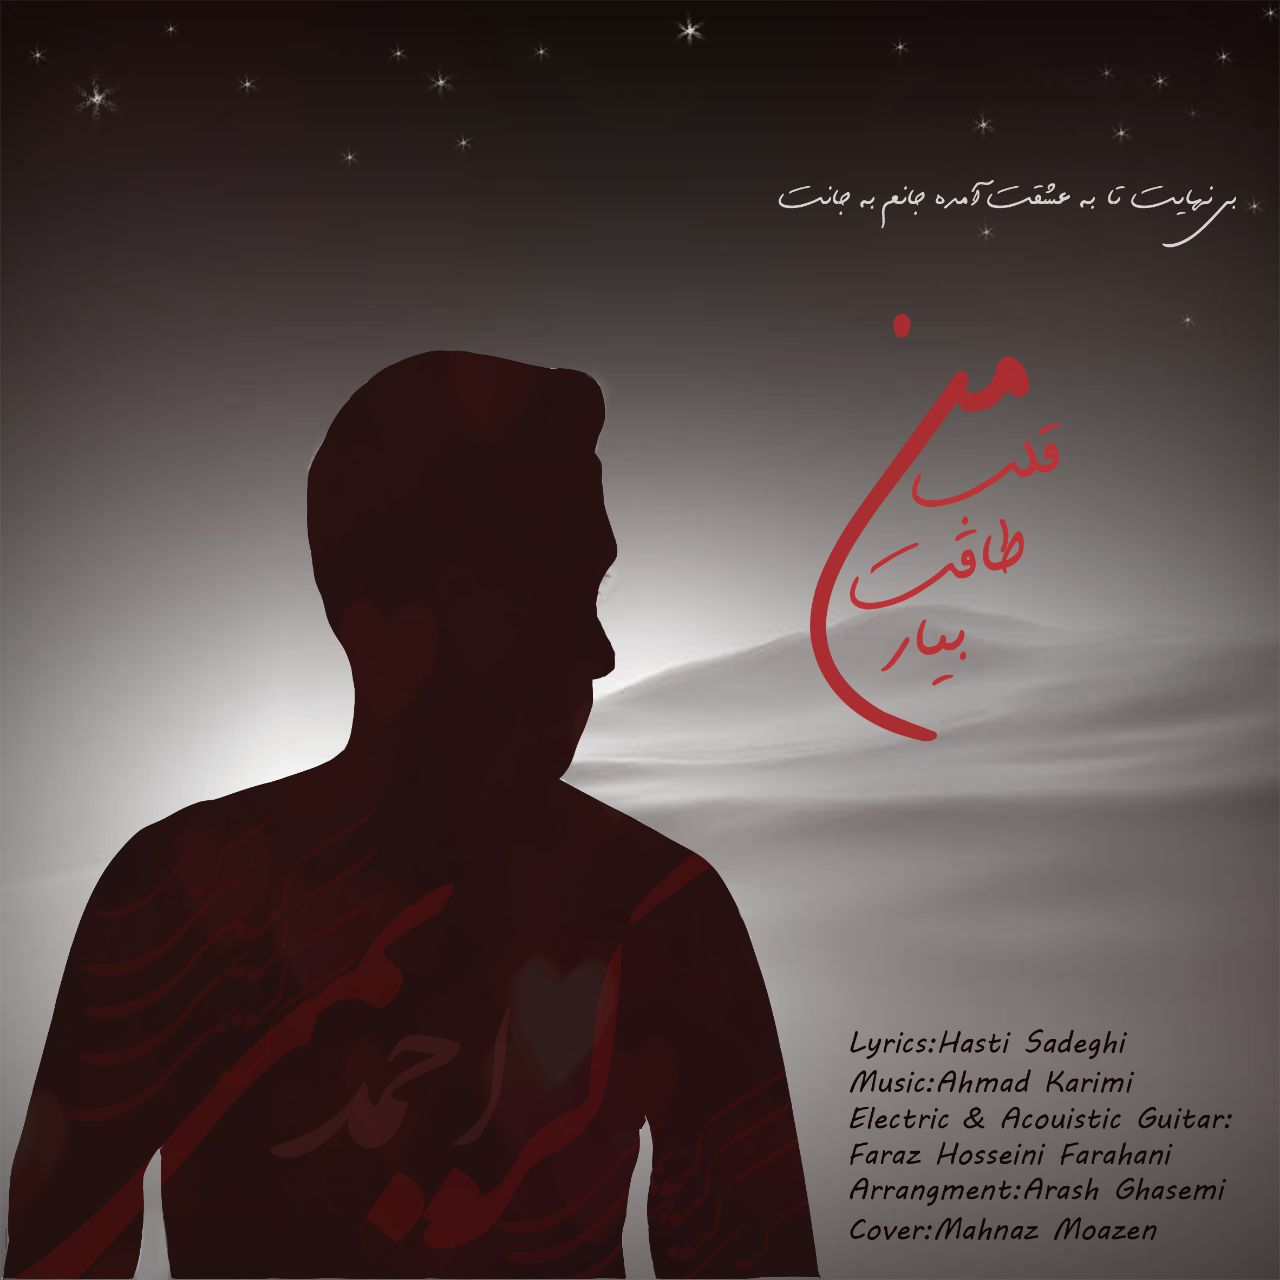 Download Ahang احمد کریمی قلب من طاقت بیار